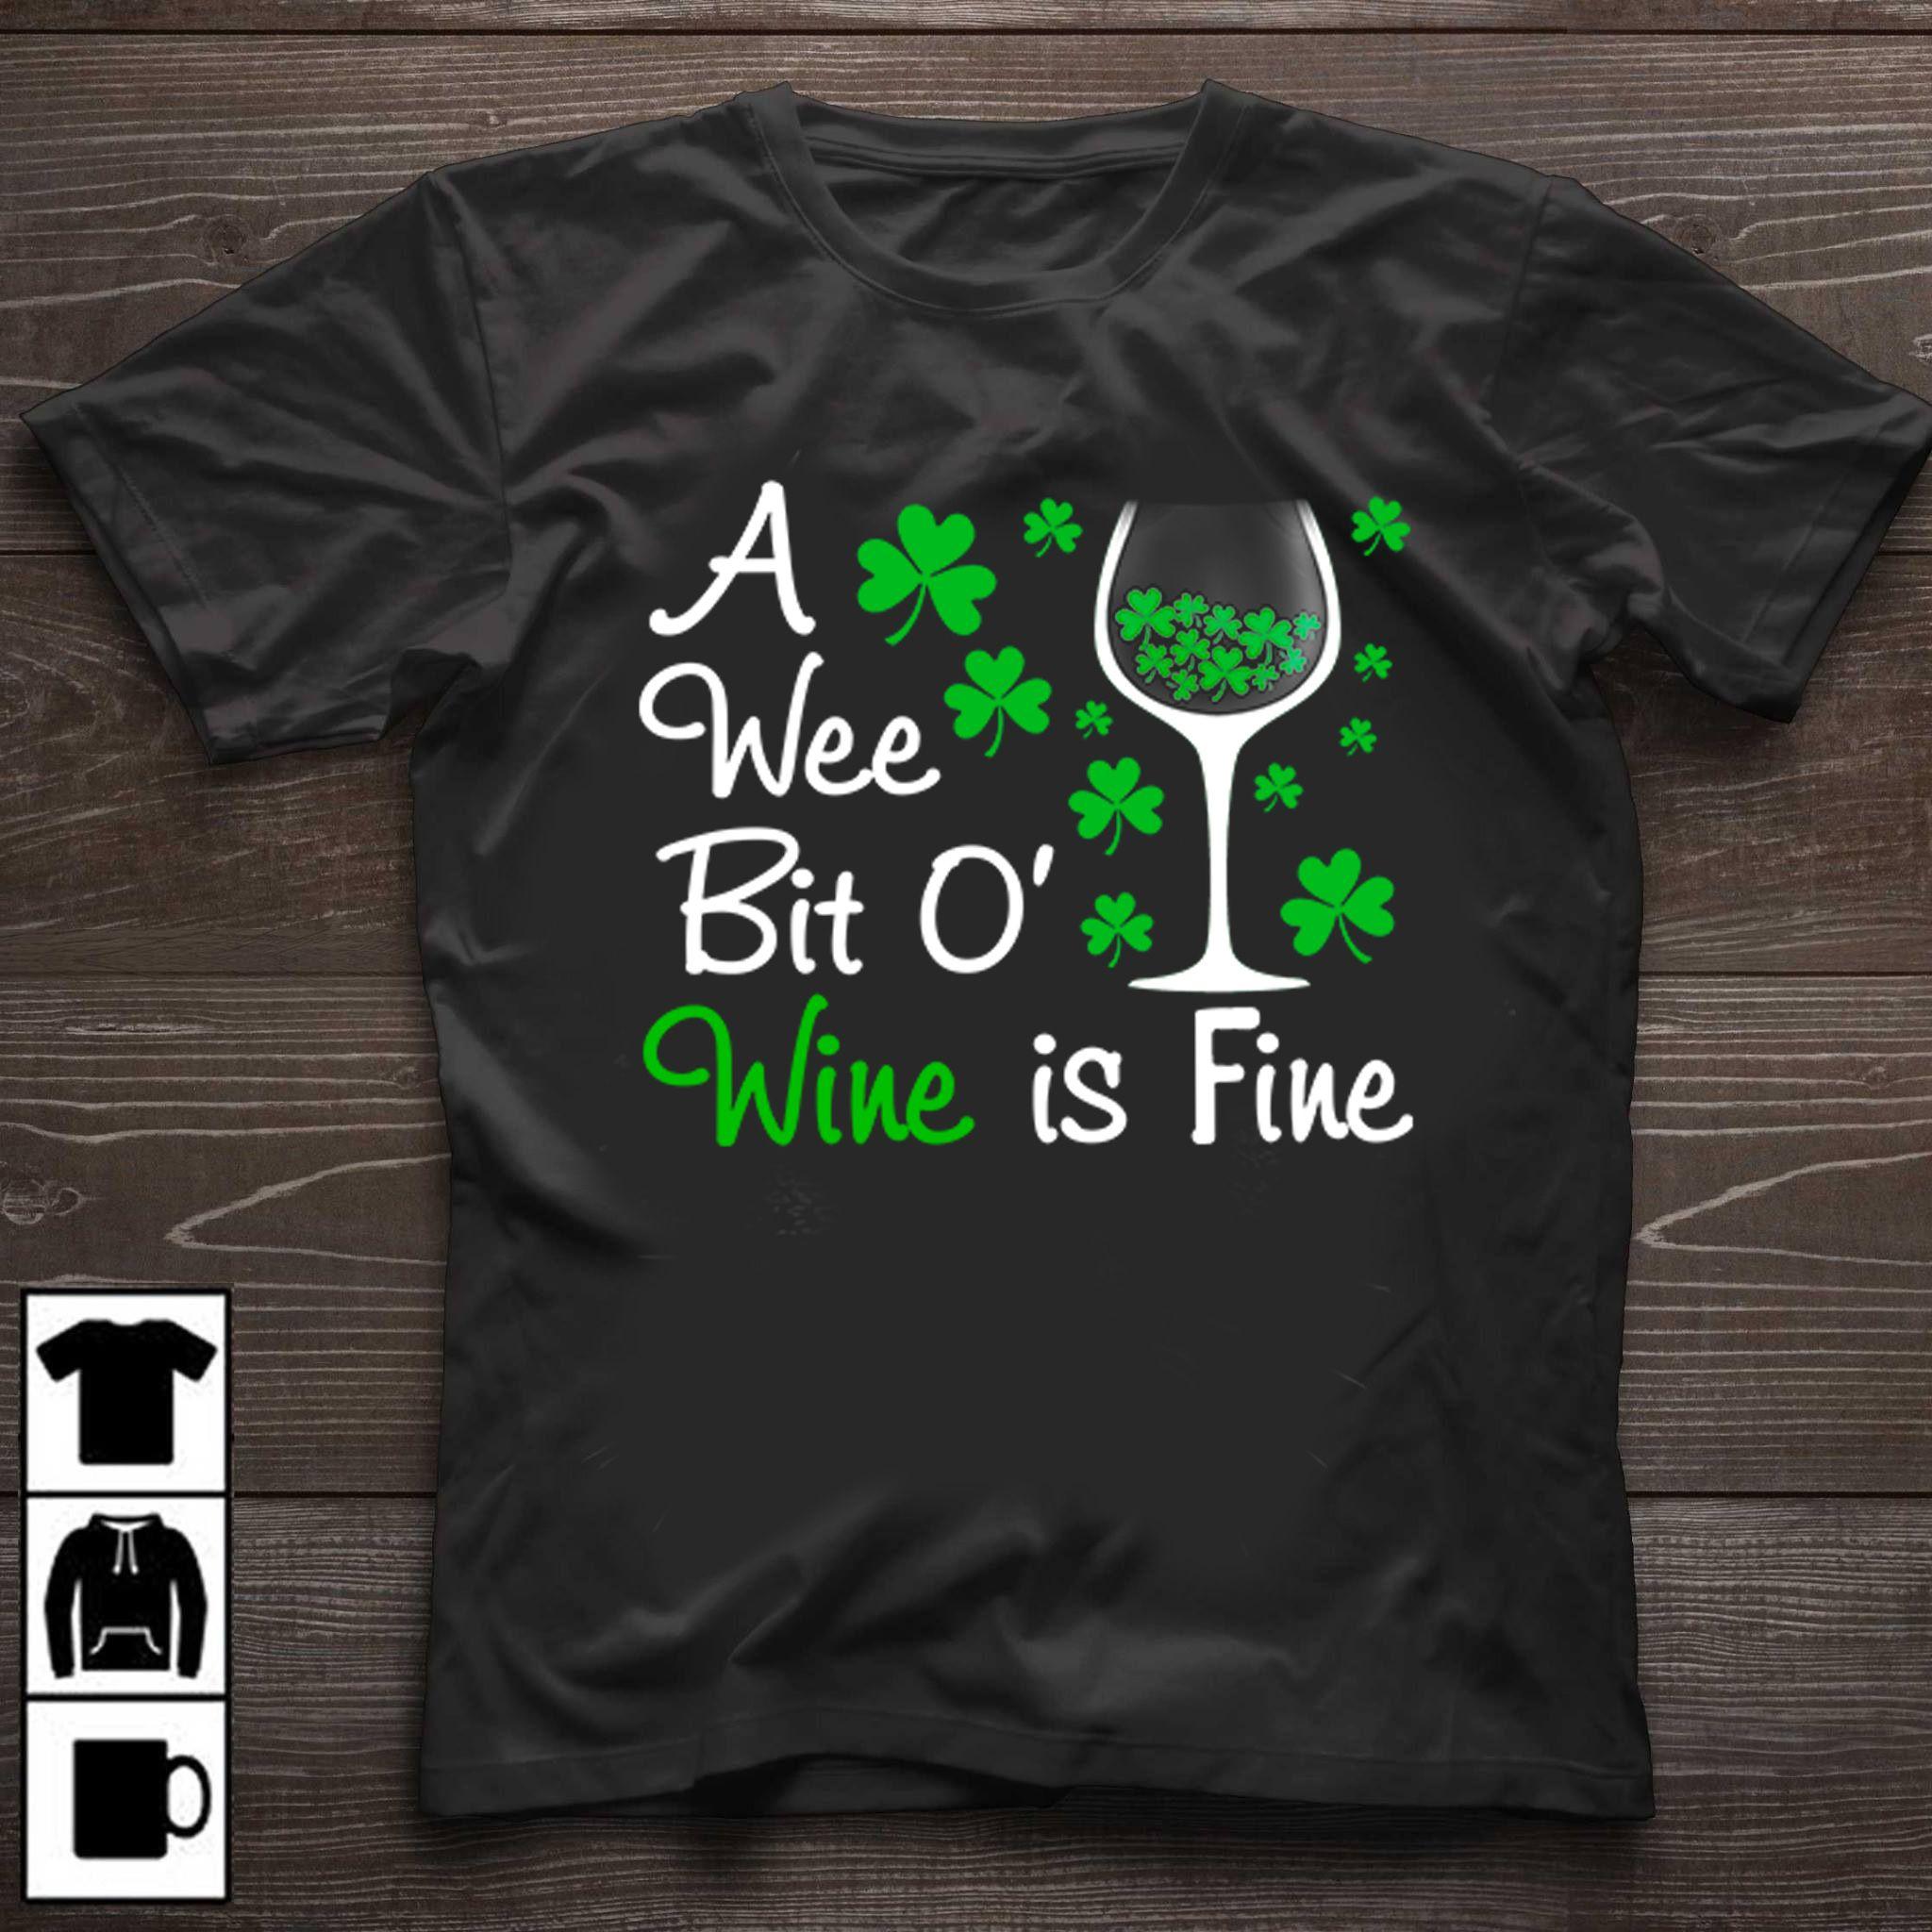 446cb87d6 Funny Irish · Shirt Shop · A Wee Bit O' Wine Is Fine-St Patricks Day T  Shirts Shop Now